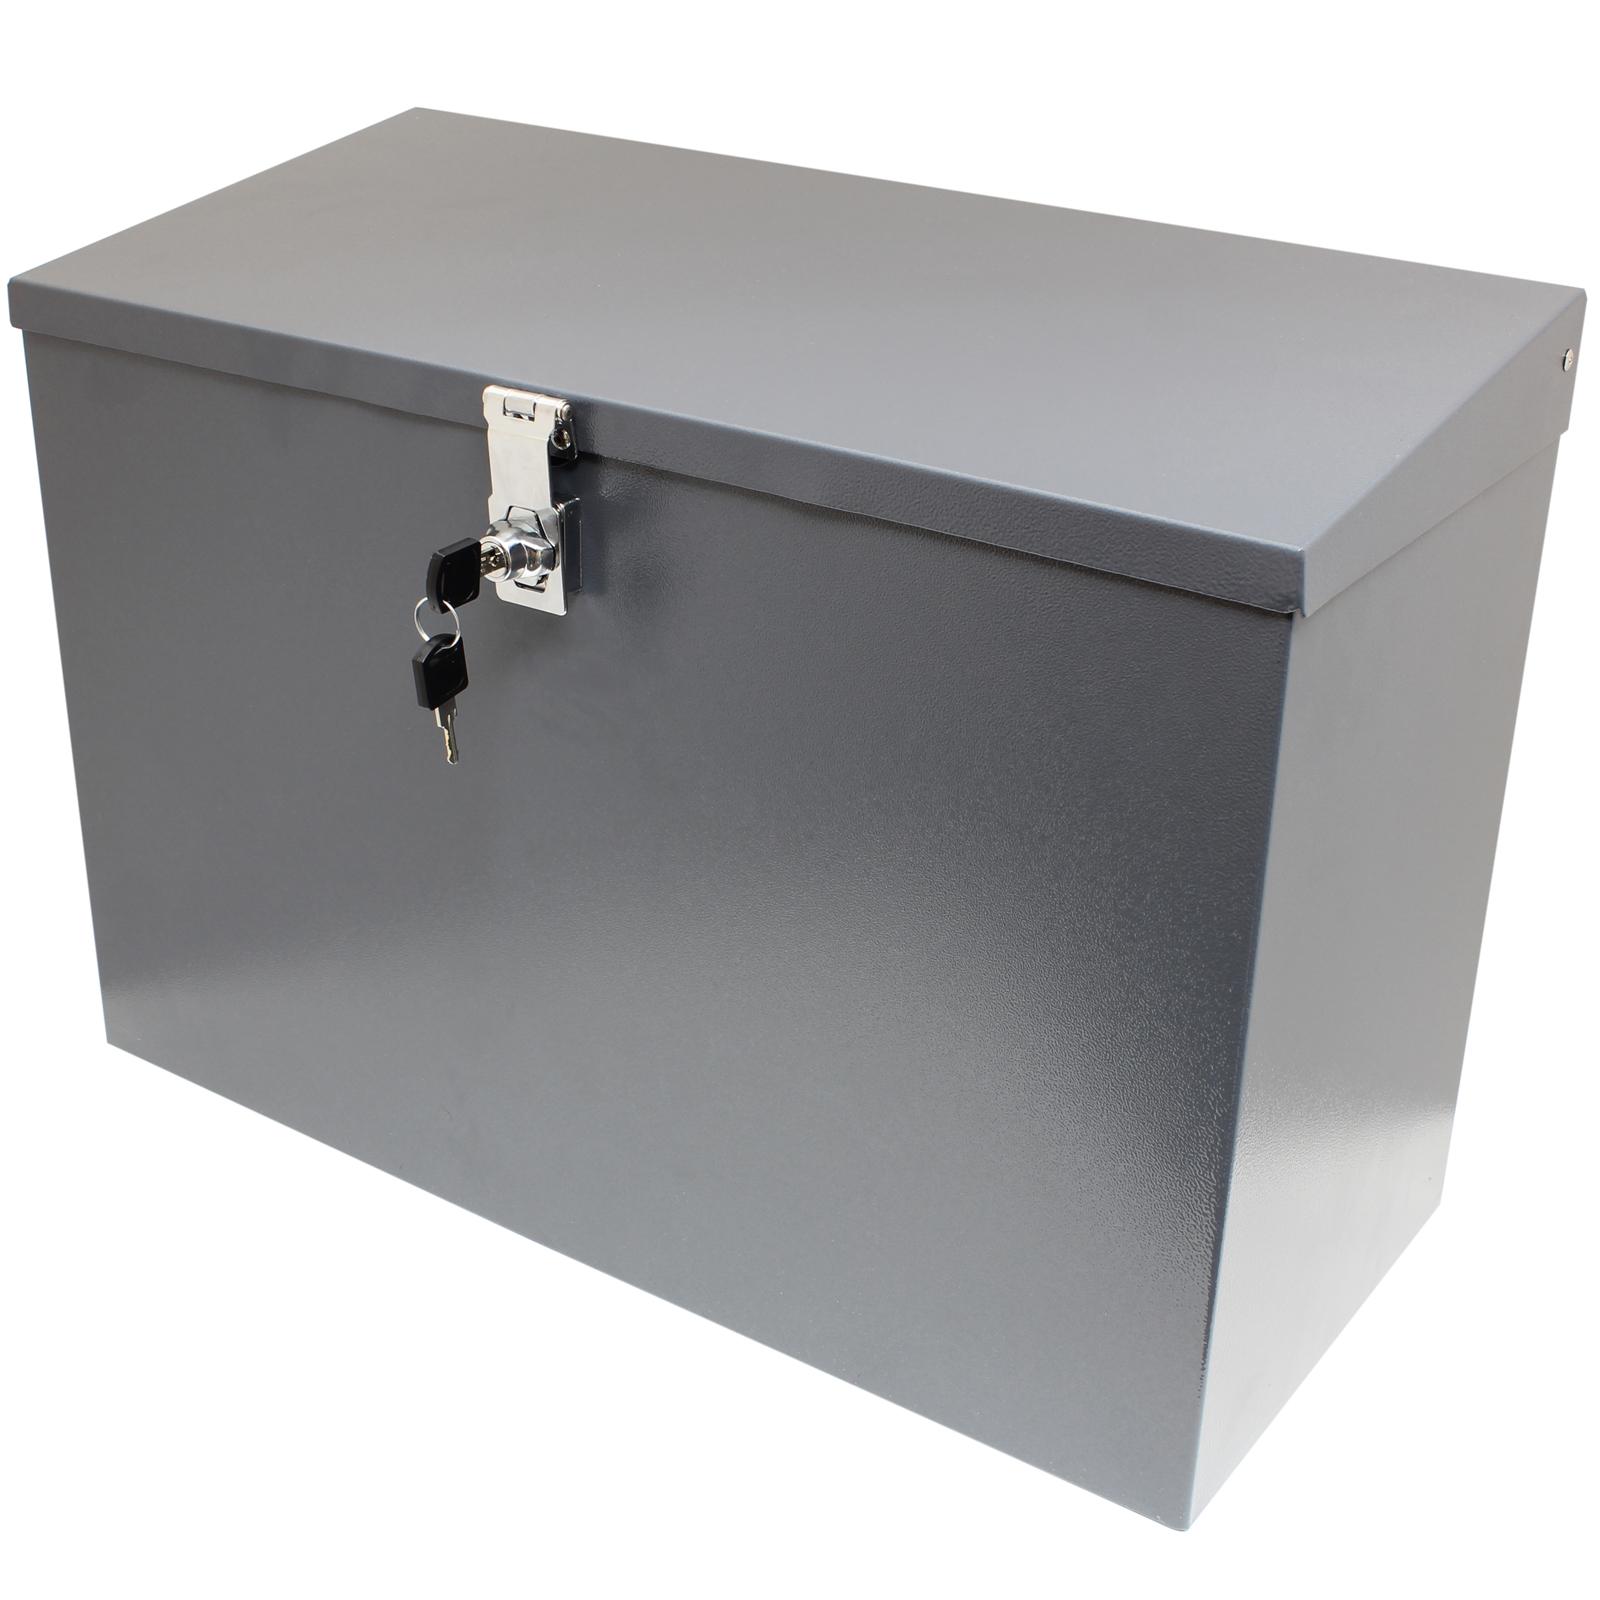 Hardcastle Large Grey Lockable Letterbox Parcel Box Home